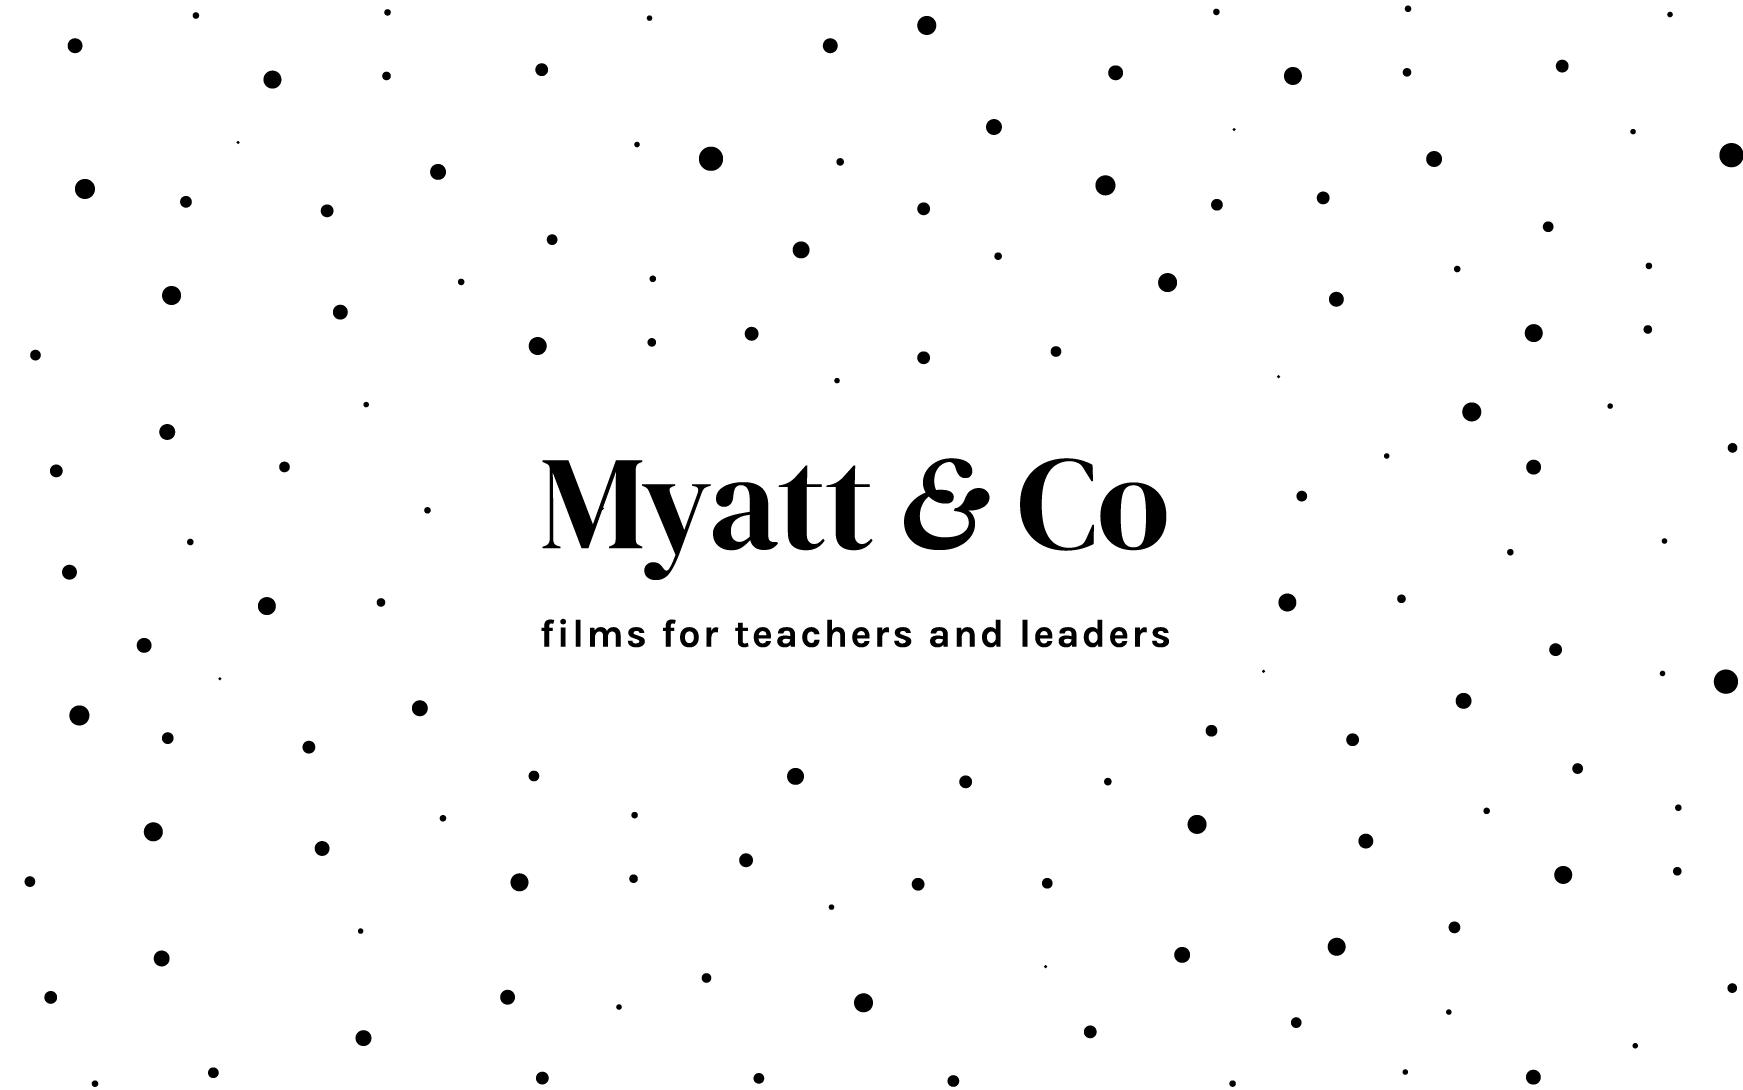 Myatt & Co Case Study-08